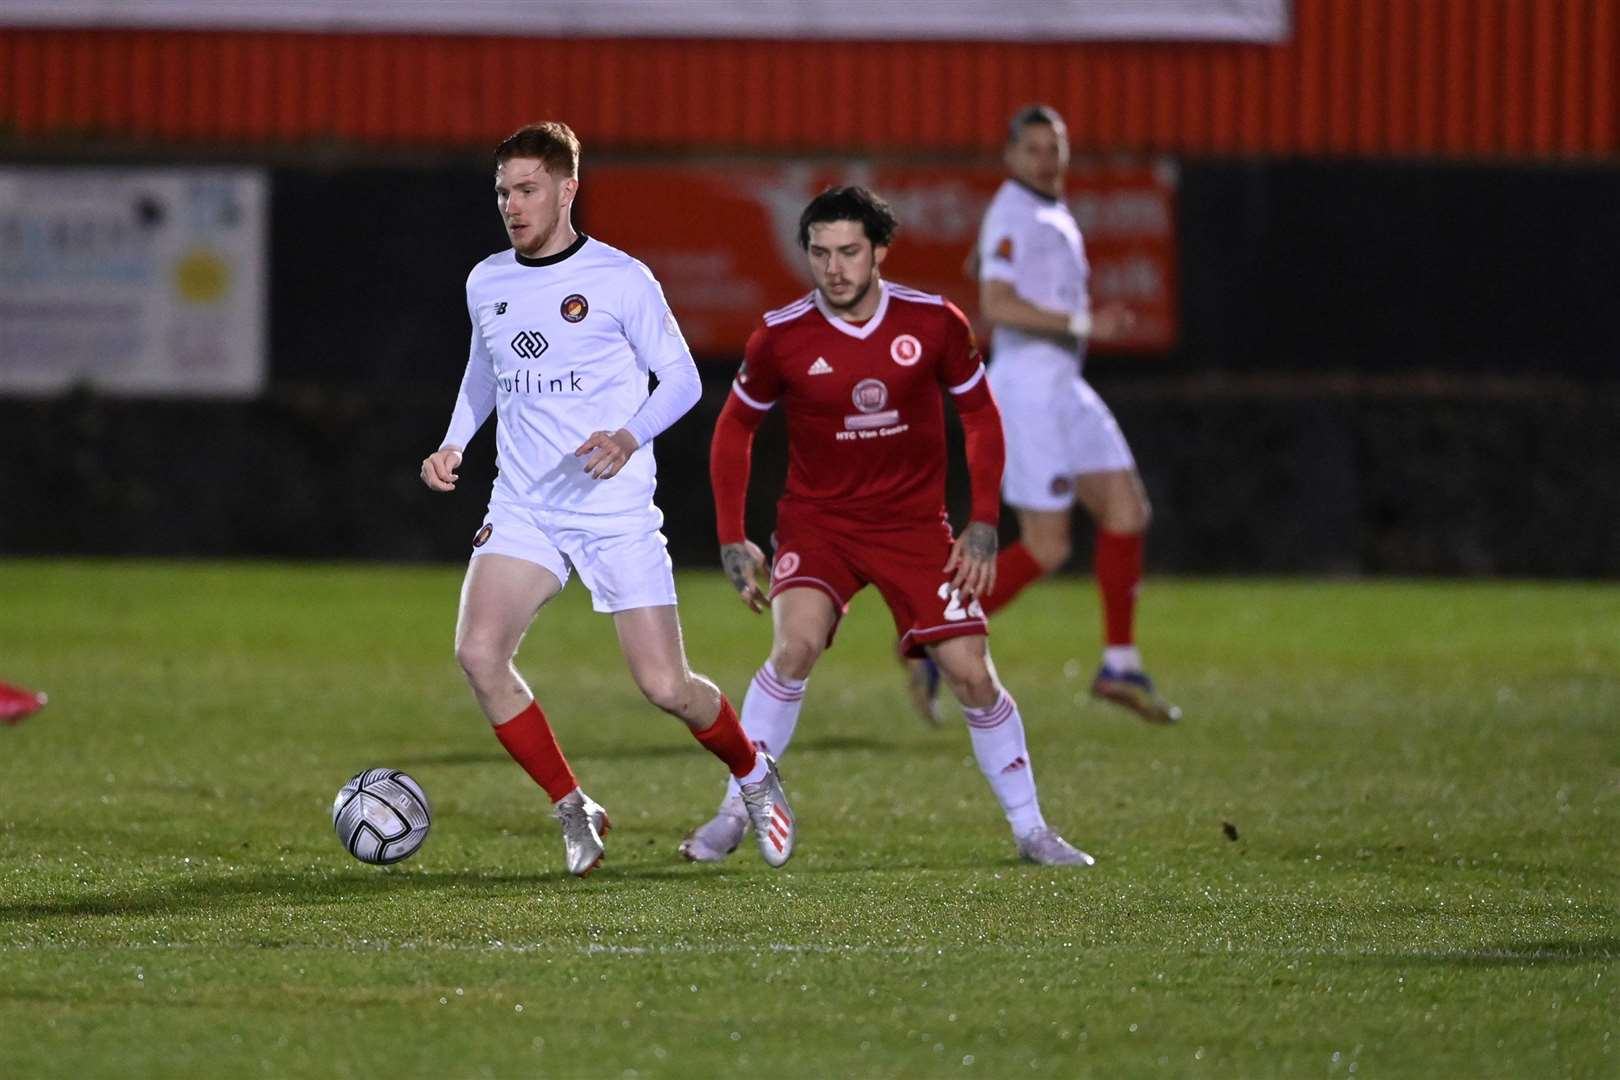 Darren Oldaker in action for Welling United last season Photo: Keith Gillard